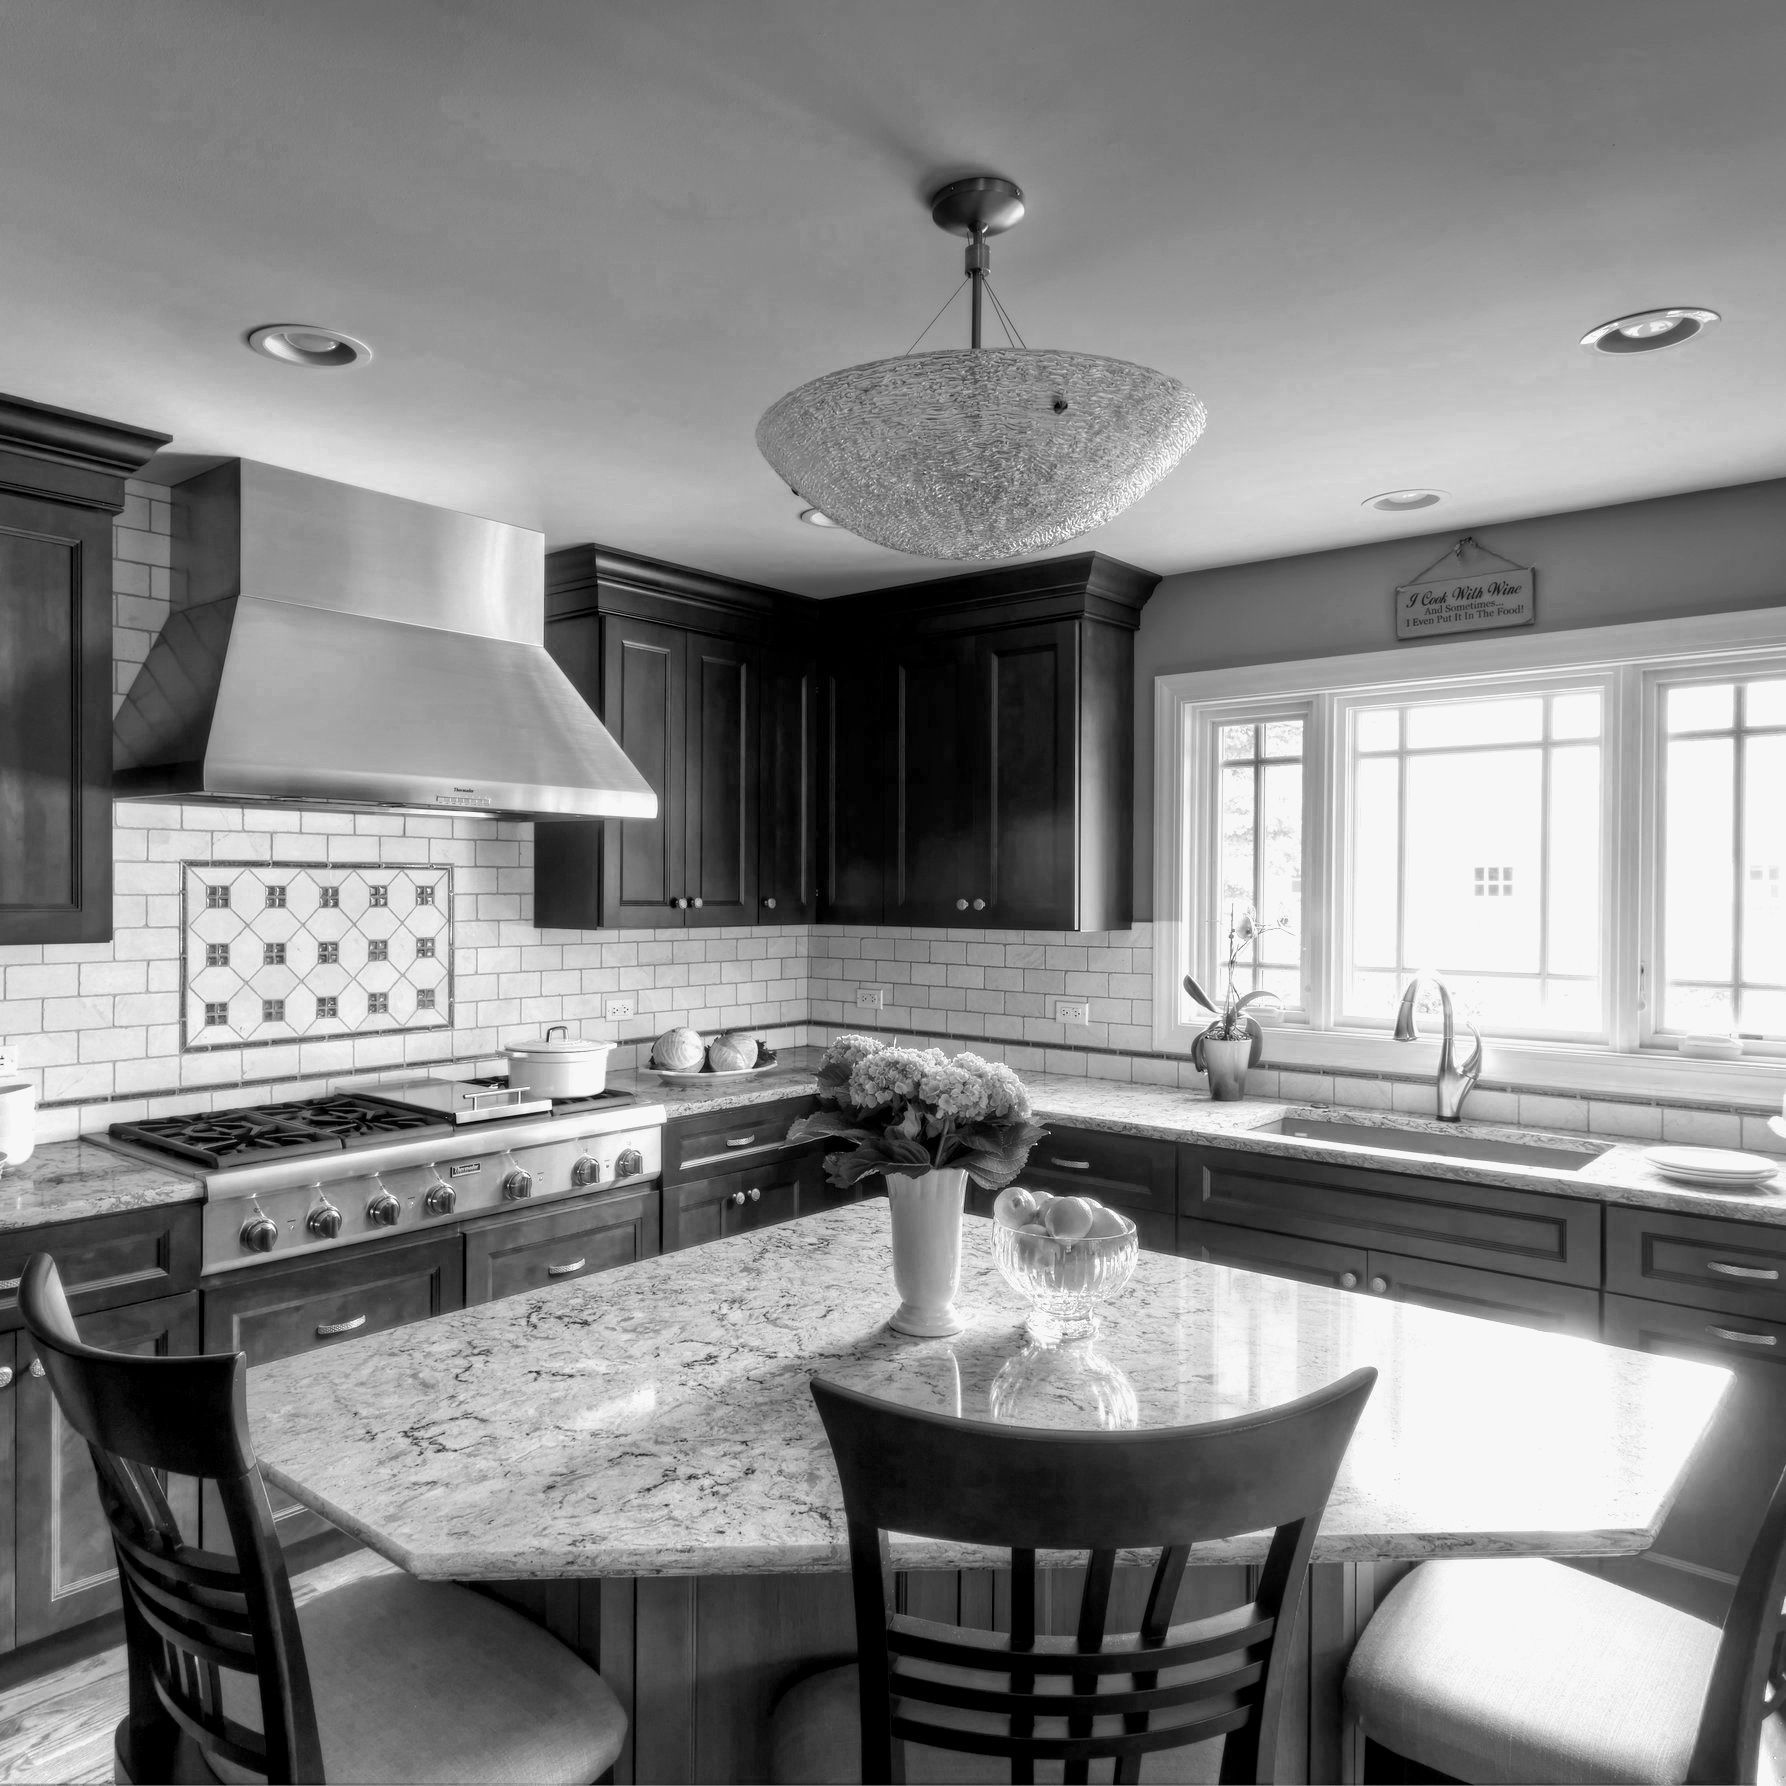 Southside kitchen -